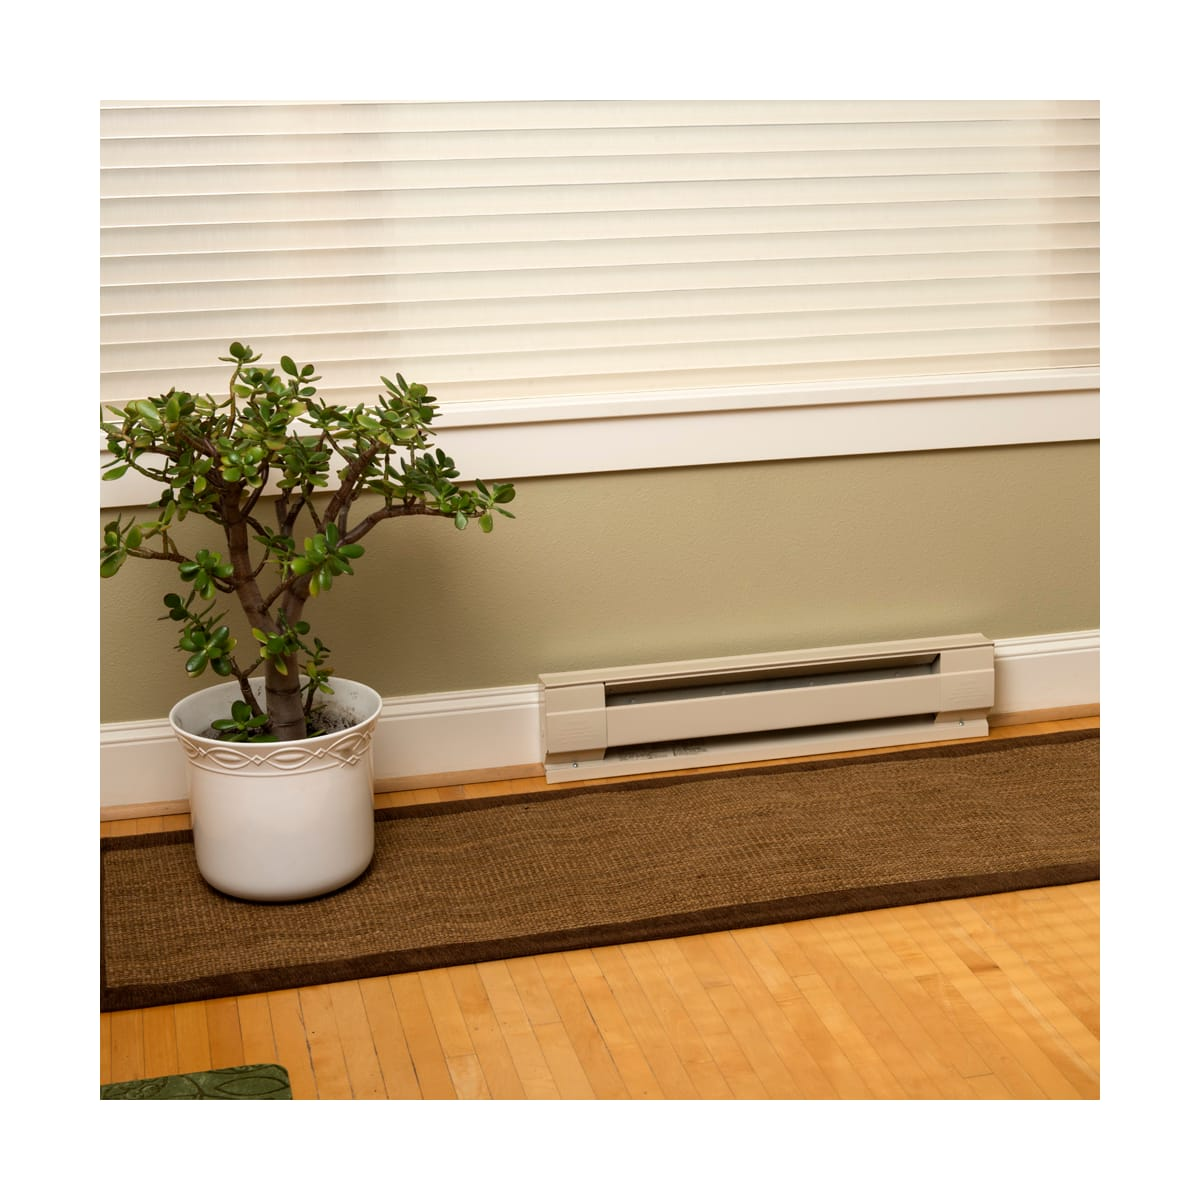 240 Volt Baseboard Heater Wiring Diagram Electric Baseboard Heater